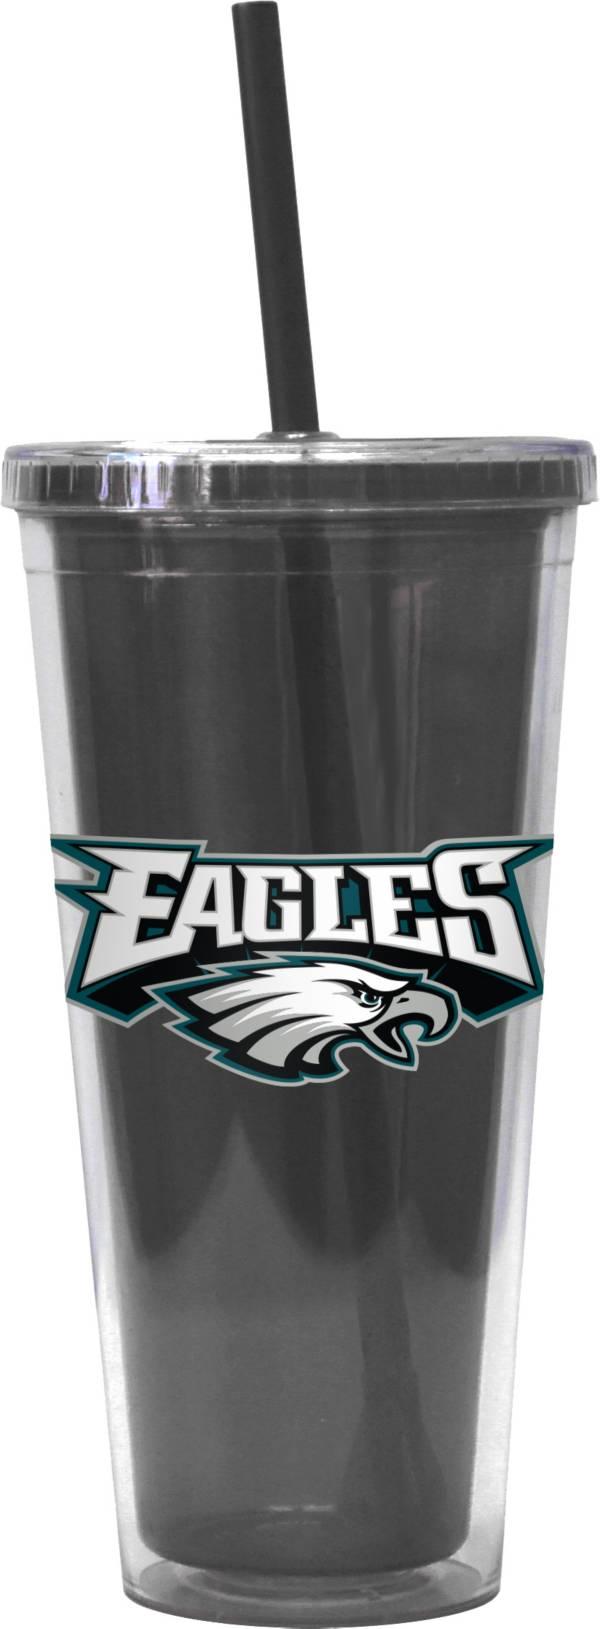 Boelter Philadelphia Eagles 22oz. Tumbler product image